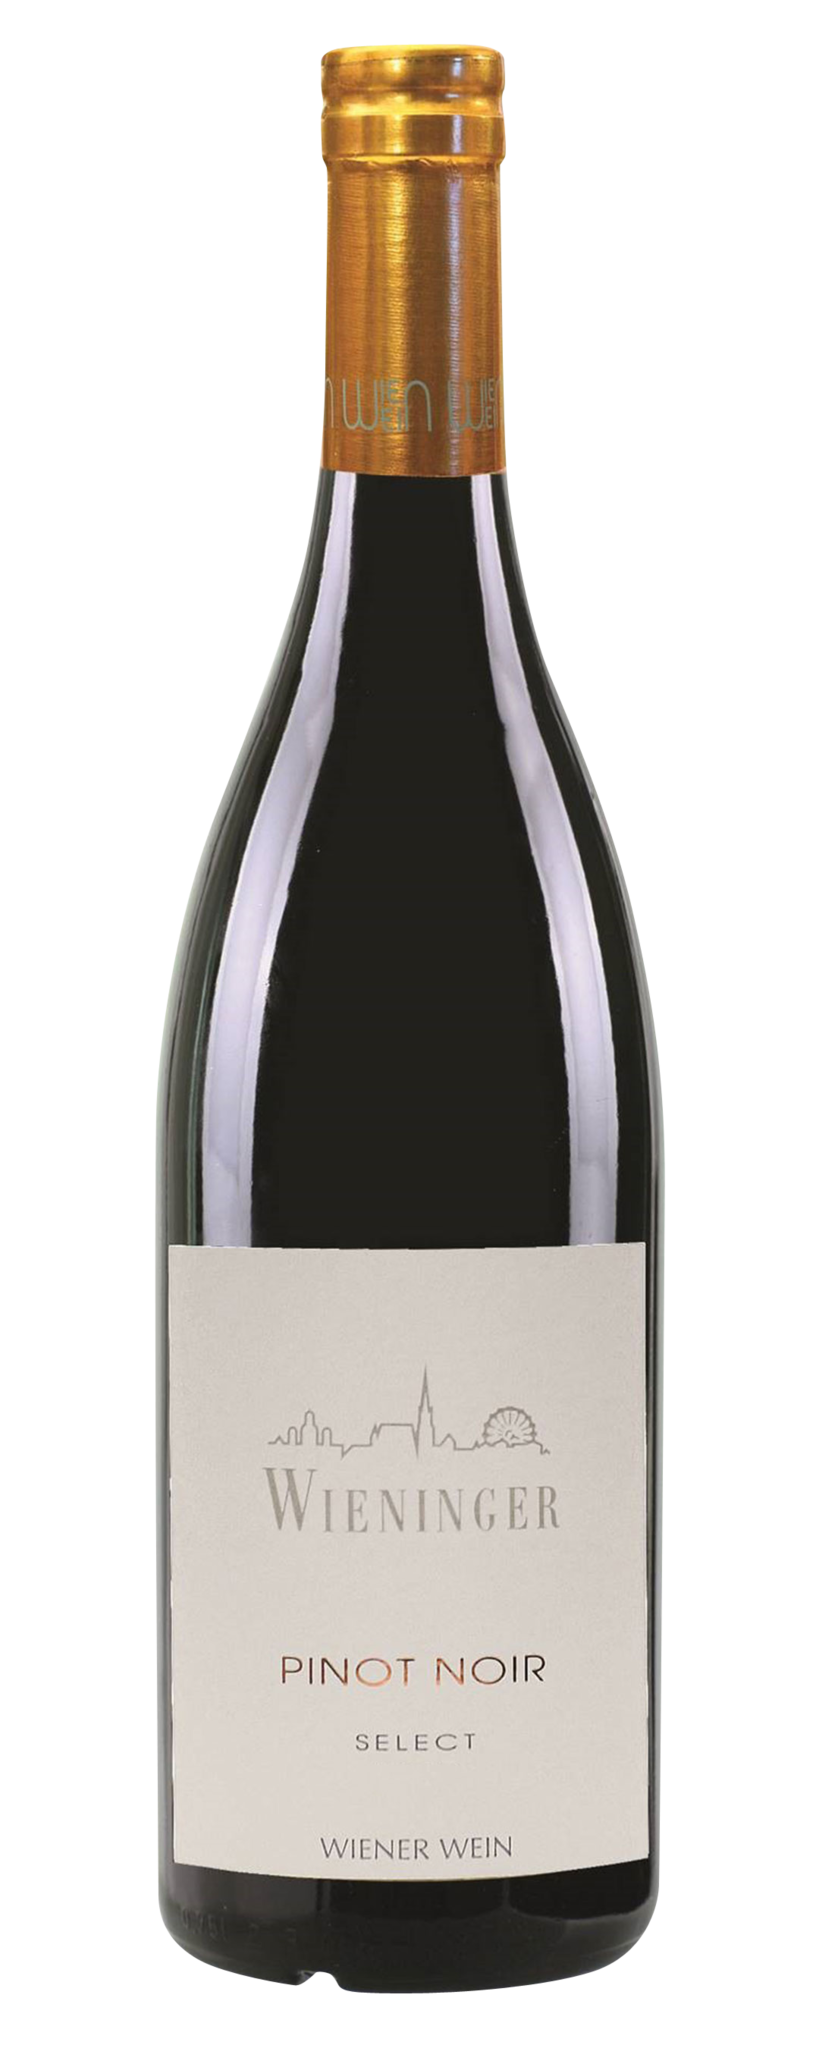 Wieninger Pinot Noir Select